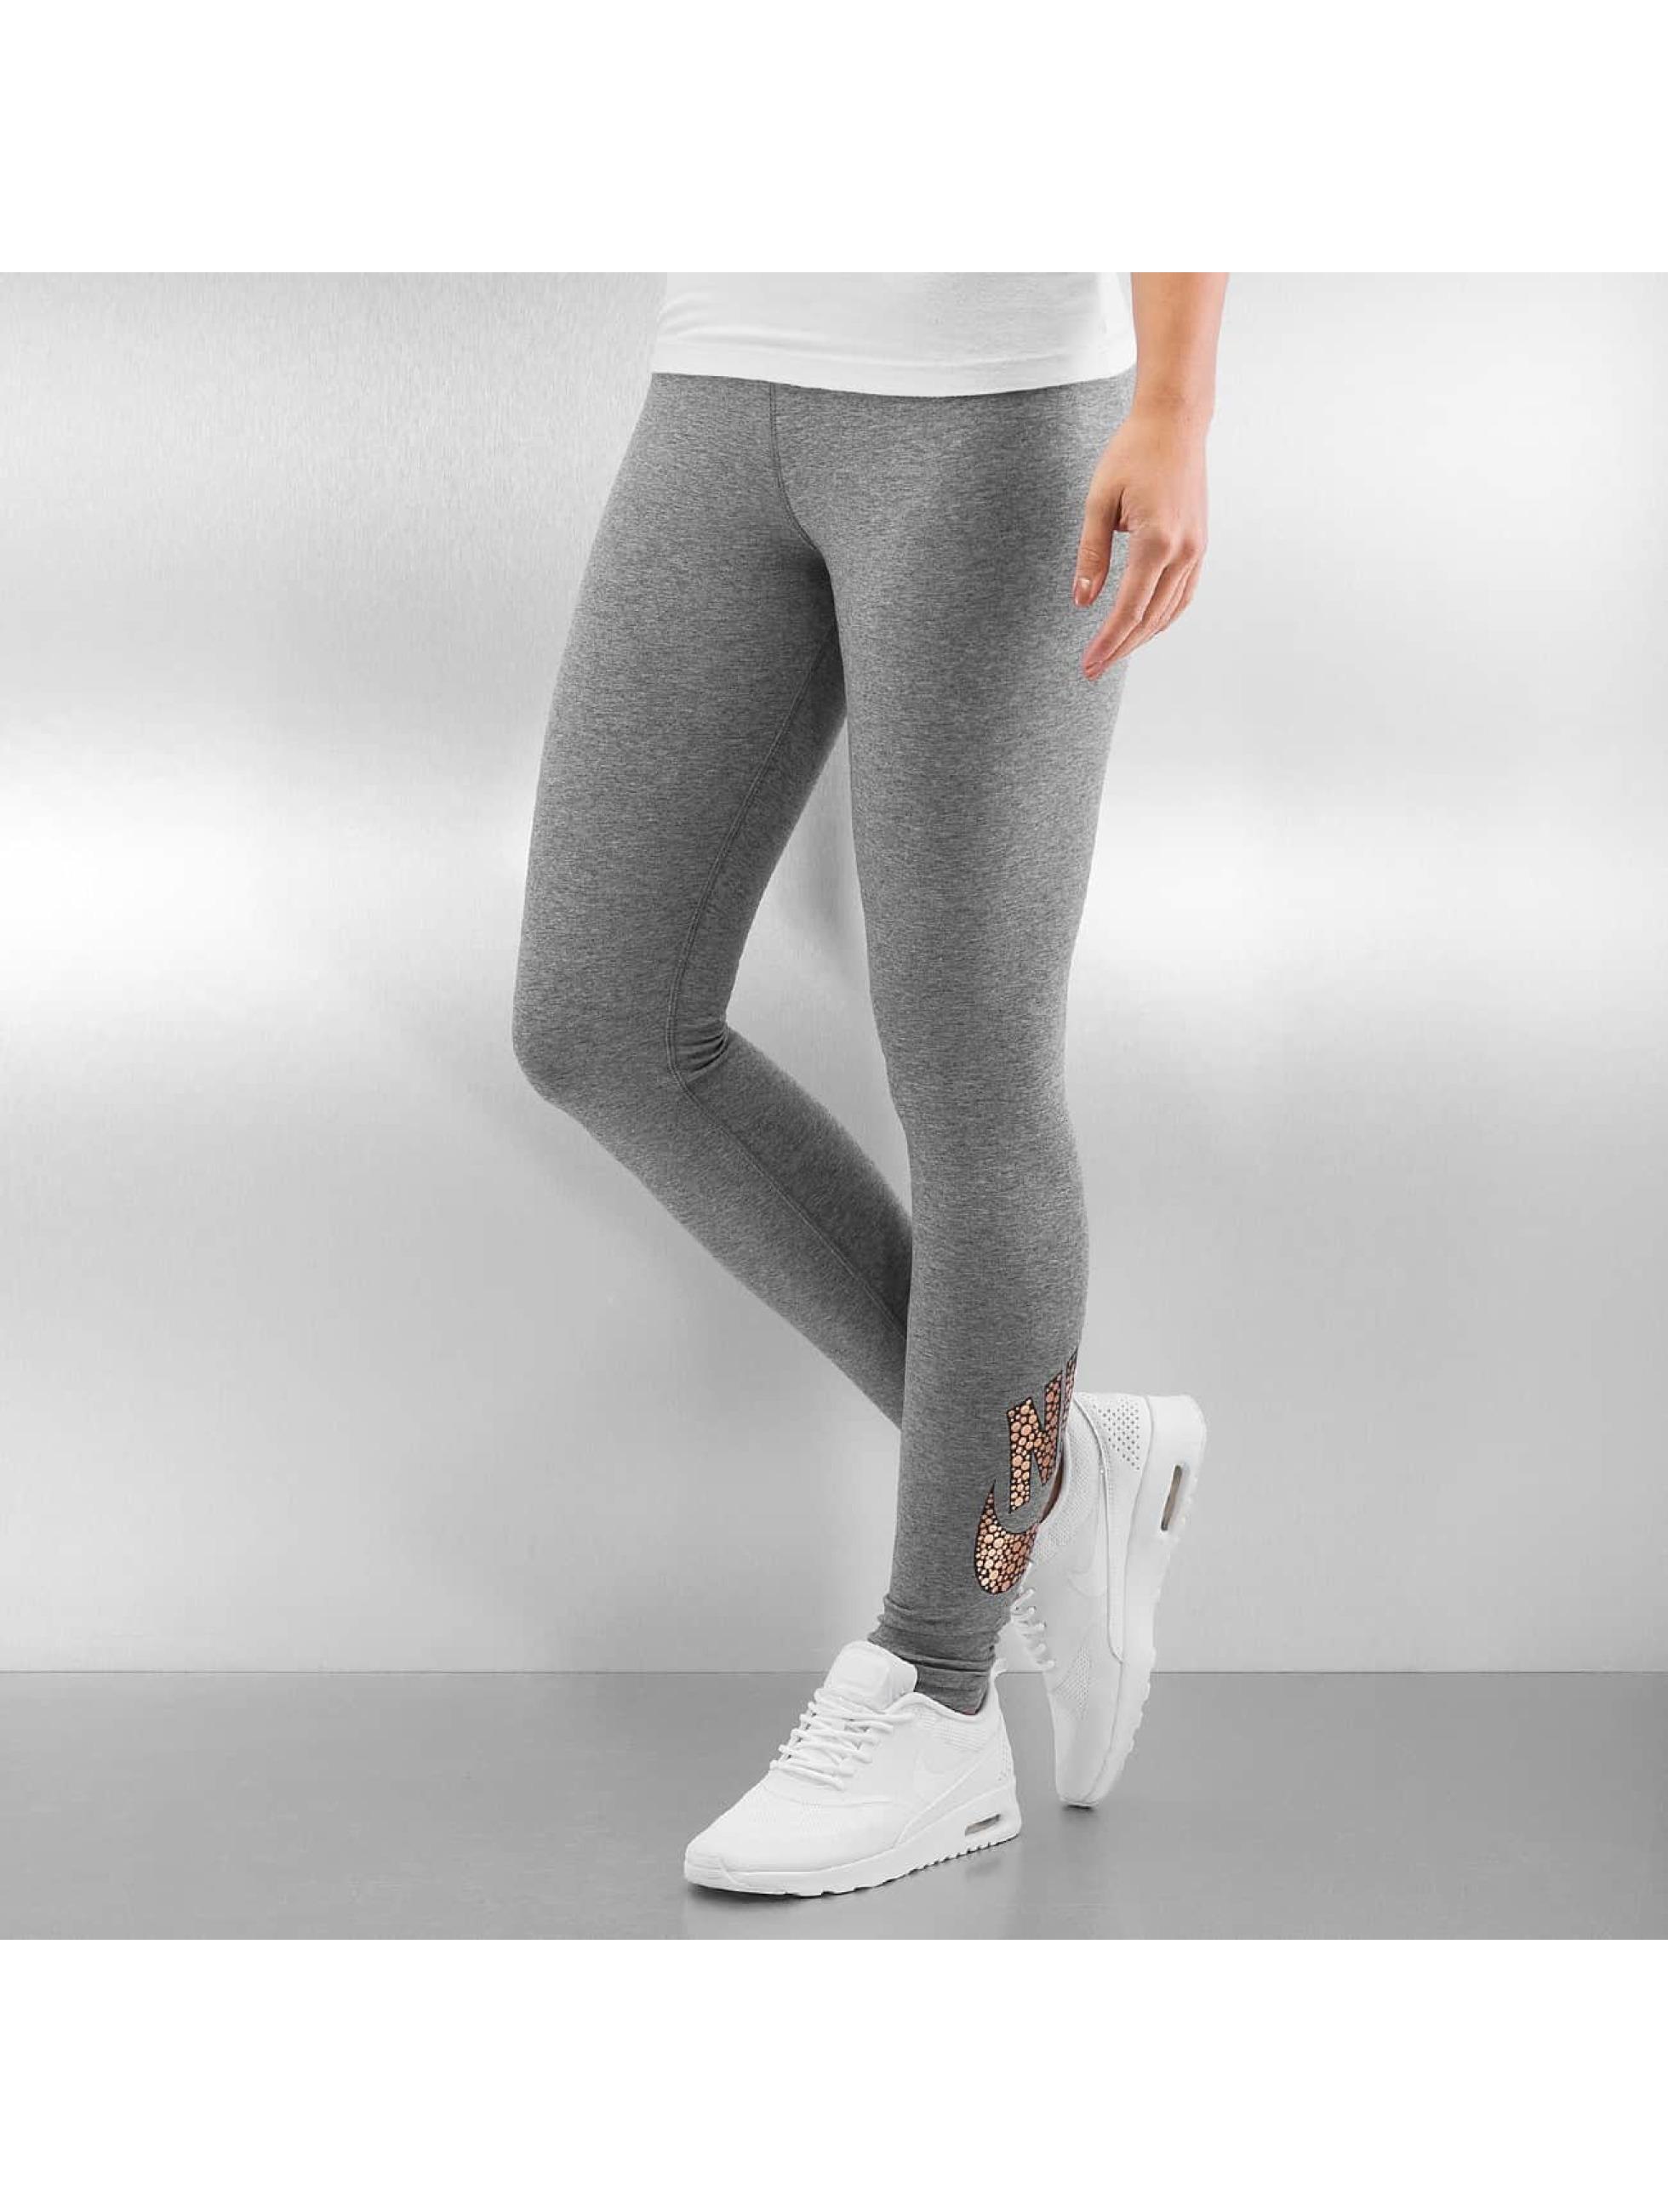 Nike Frauen Legging Sportswear in grau